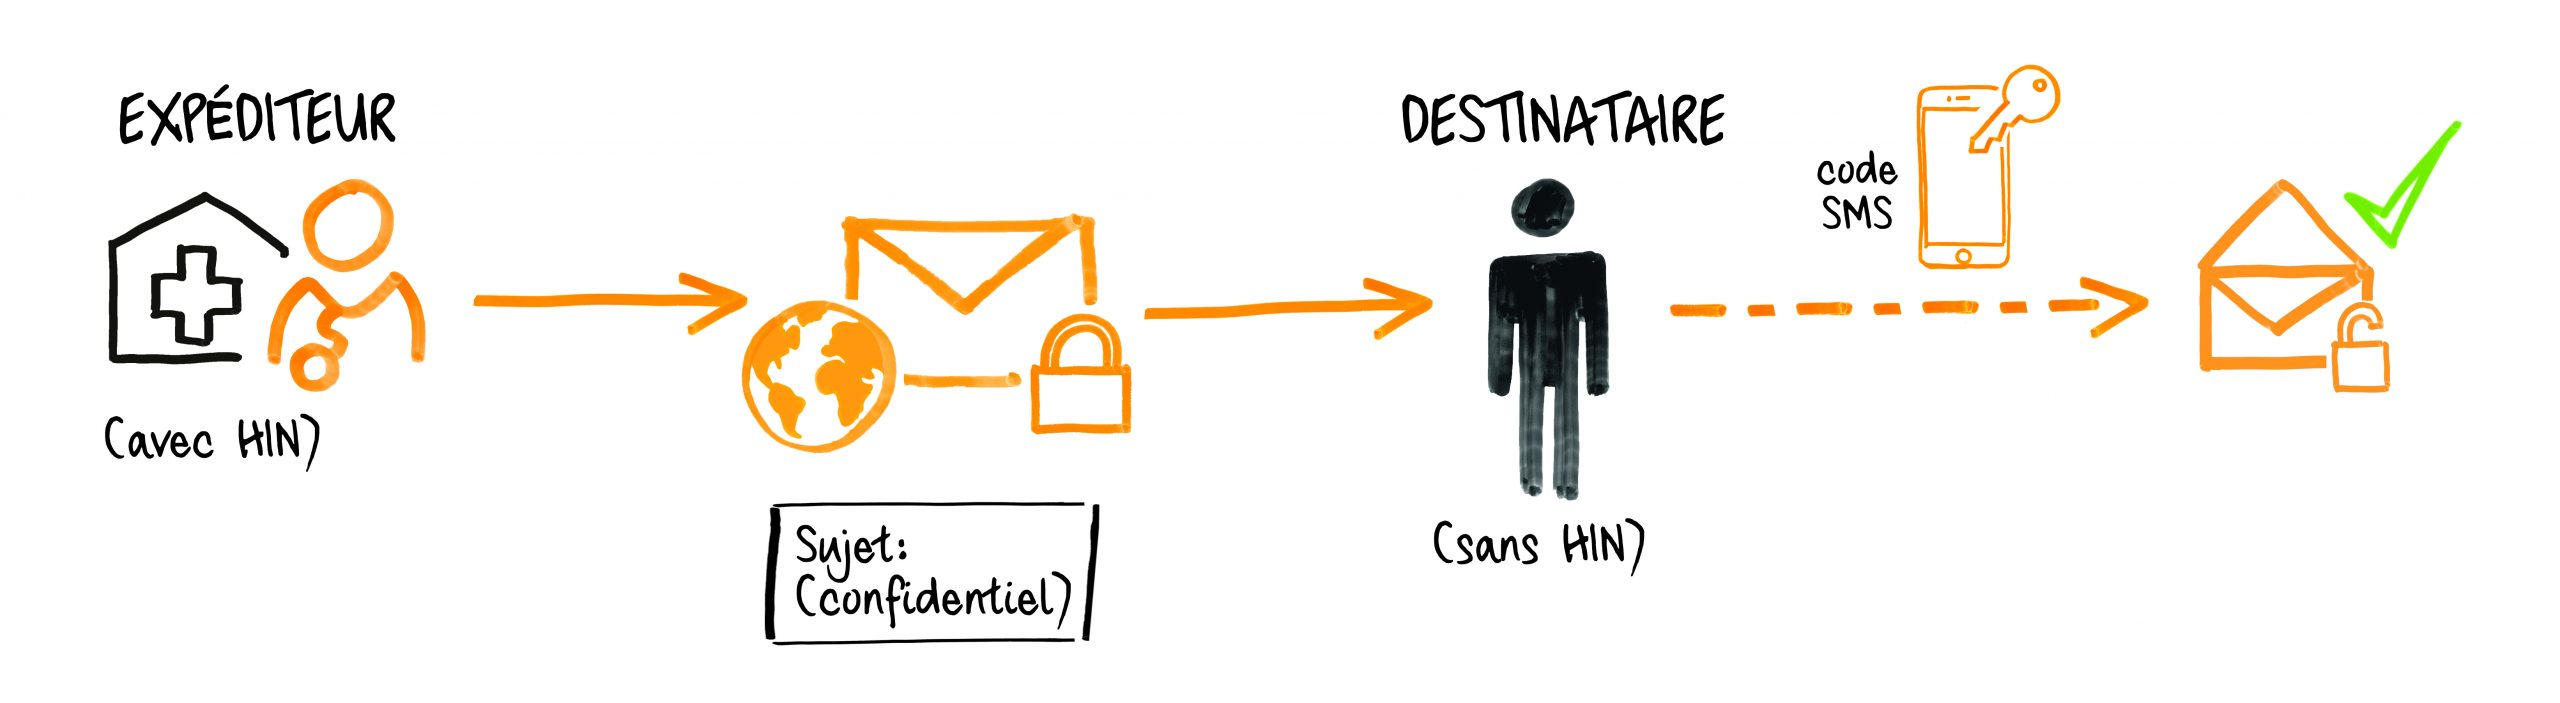 Serviceskizze HIN Mail Global - Mails an alle Empfänger sicher verschlüsseln